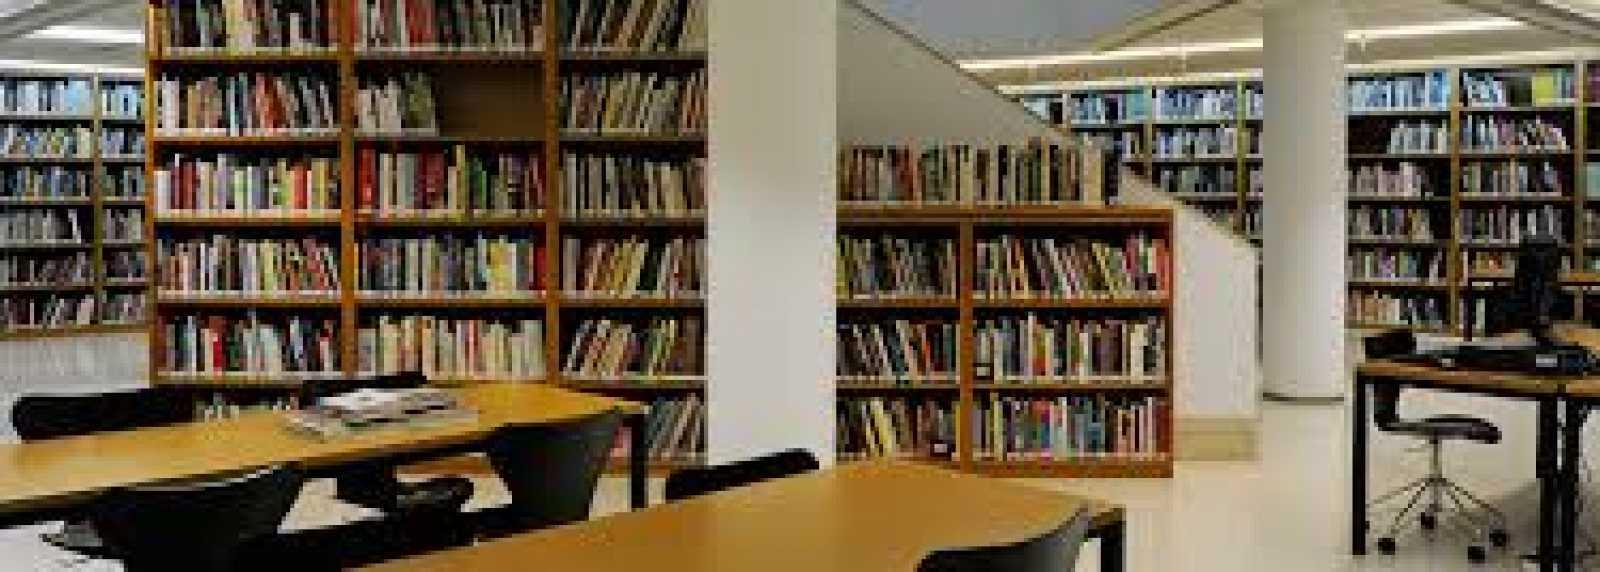 Entrevista Biblioteca Ivam - 19/01/20 - Escuchar ahora